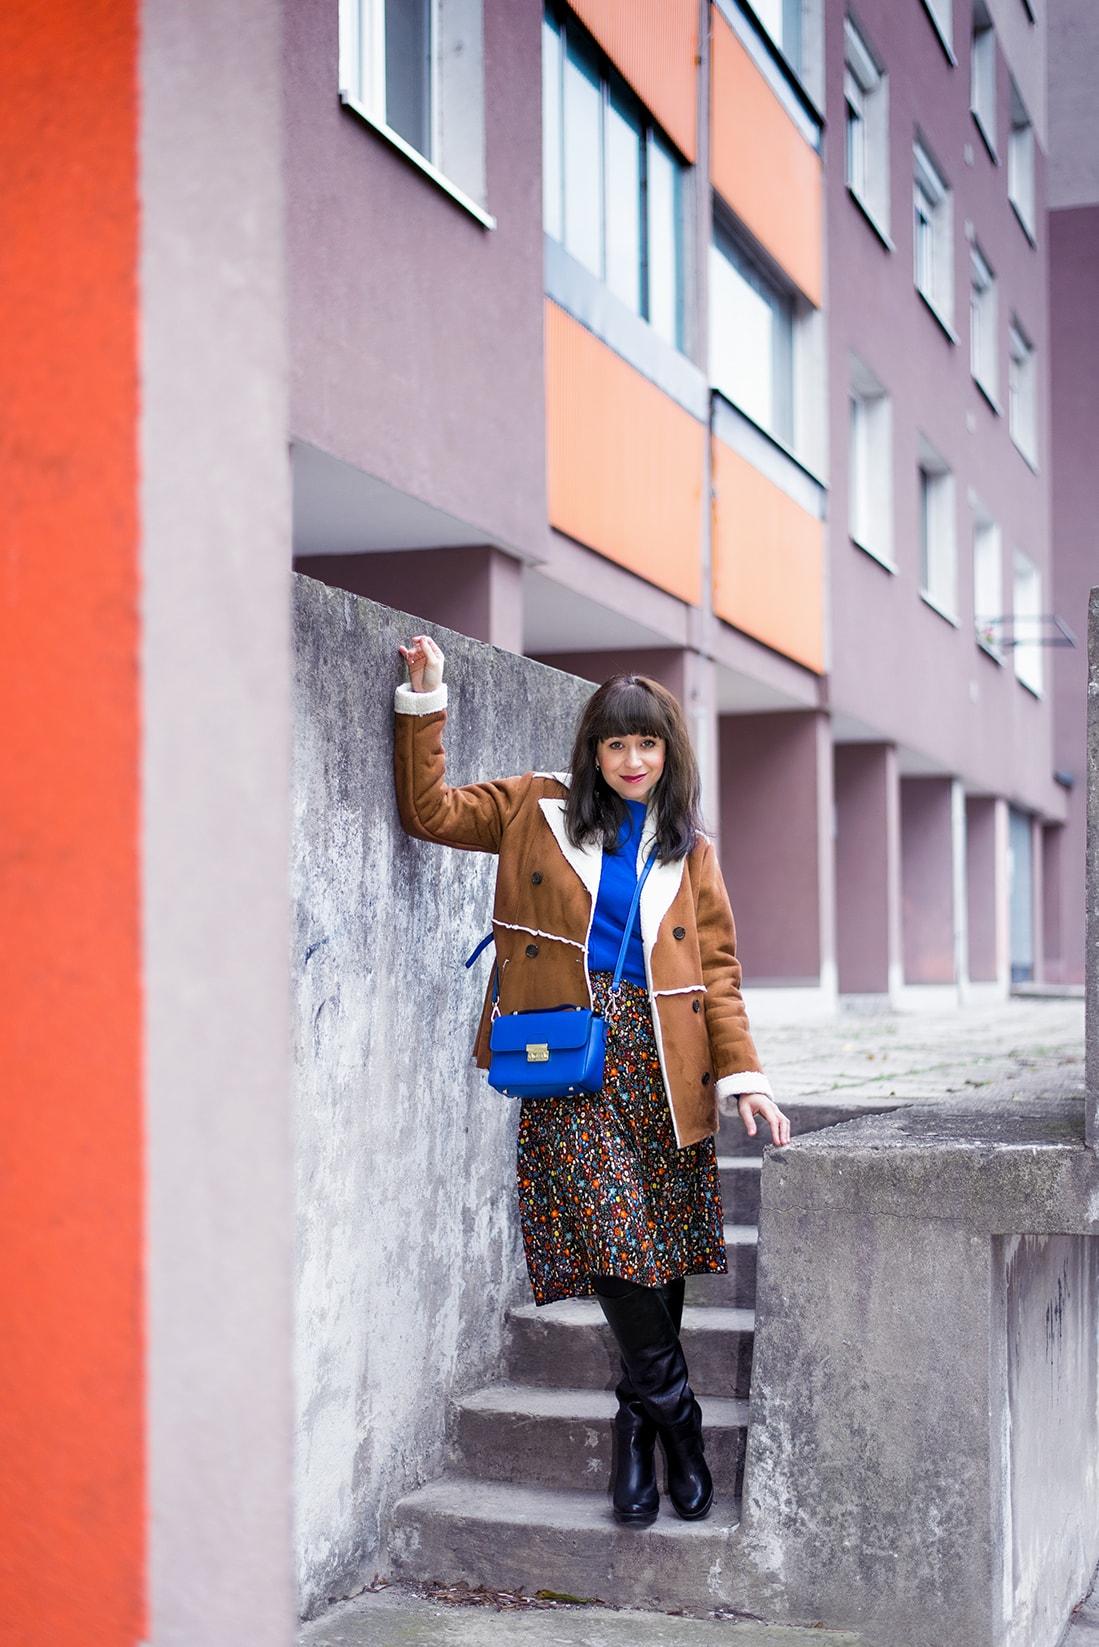 V NOWOM TARGU A SEMIŠOVÁ BUNDA NIELEN PRE BLOGERKU_Katharina-fashion is beautiful blog 1_Kvetovaná plisovaná sukňa_Kabelka JEJ_Katarína Jakubčová_Fashion blogerka